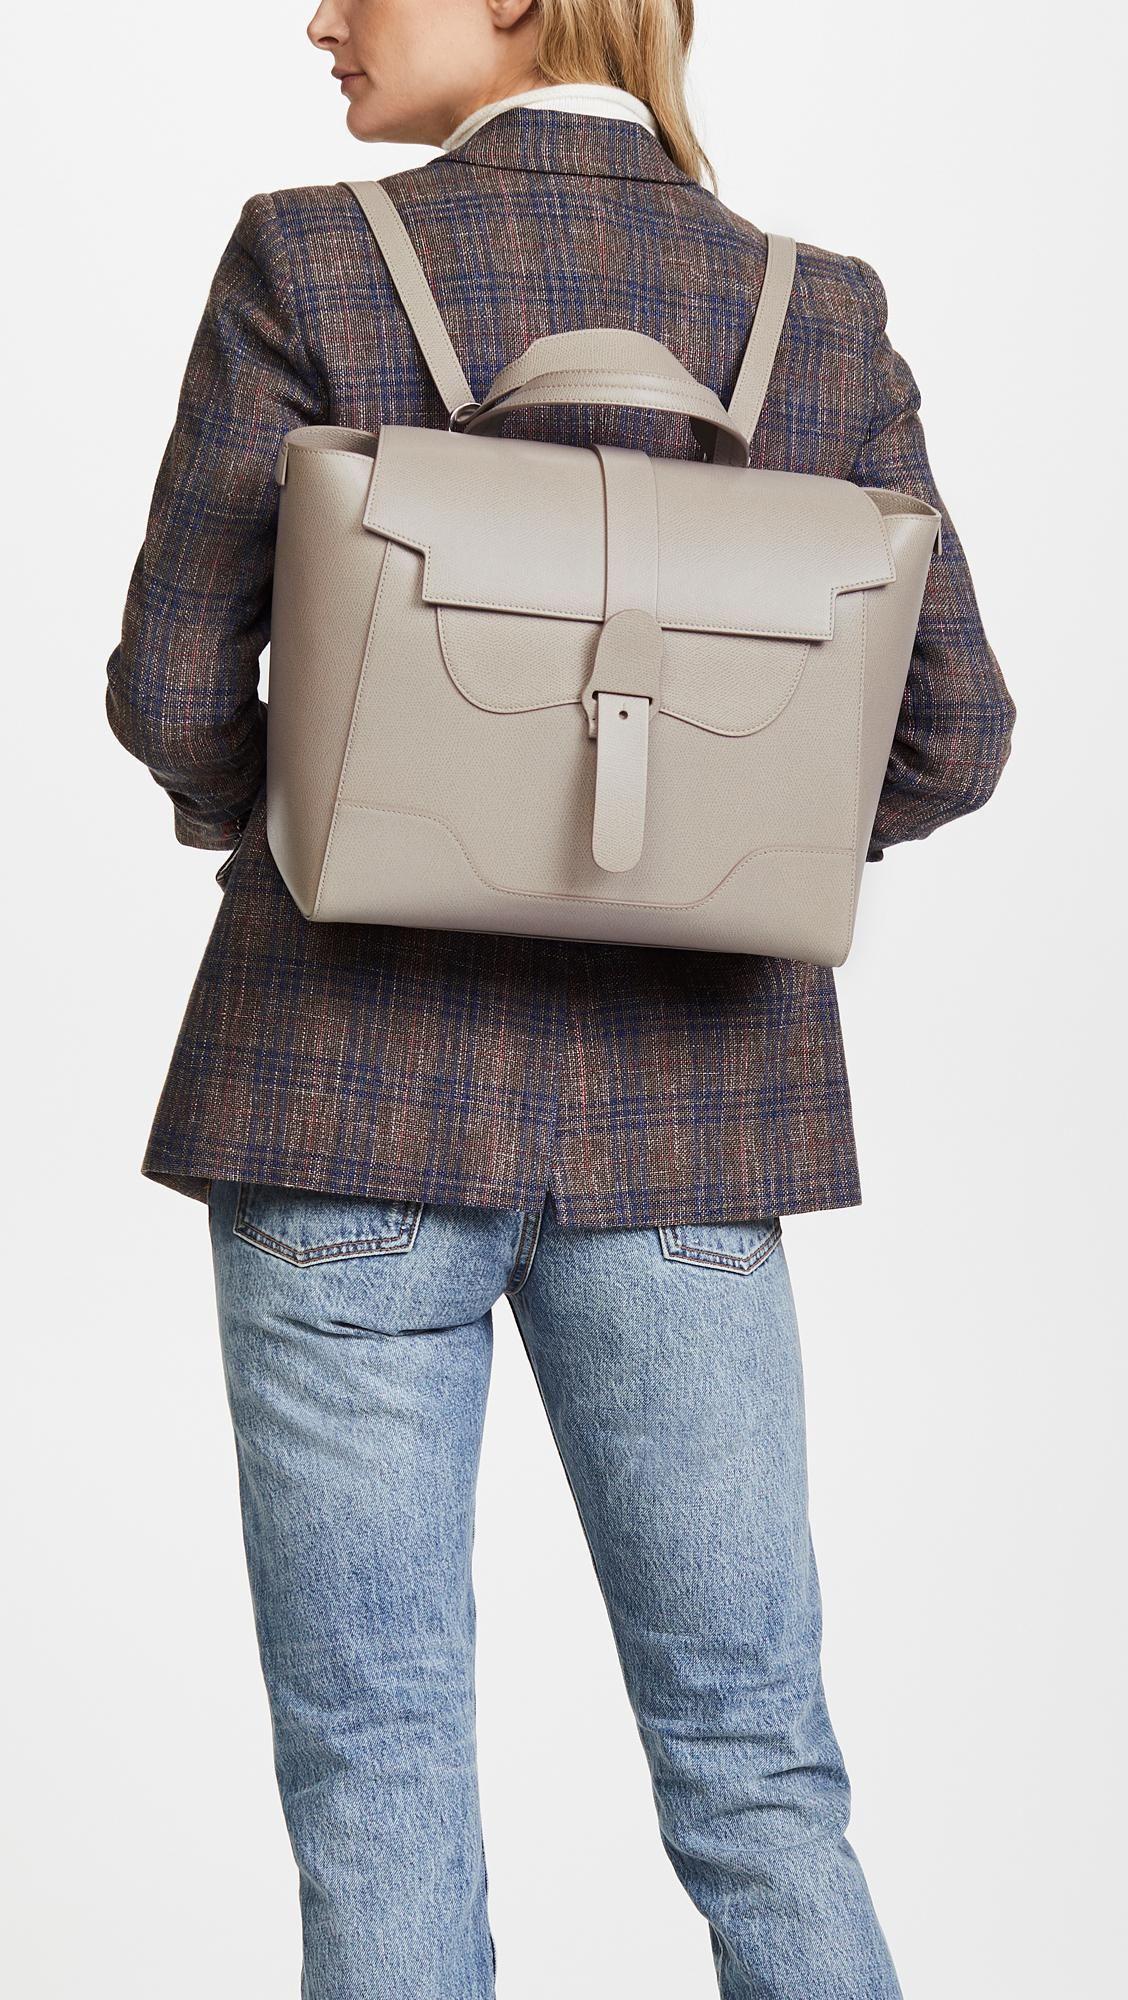 Image result for senreve maestra sand   Bags I d Love to Wear   How ... bed639cefb